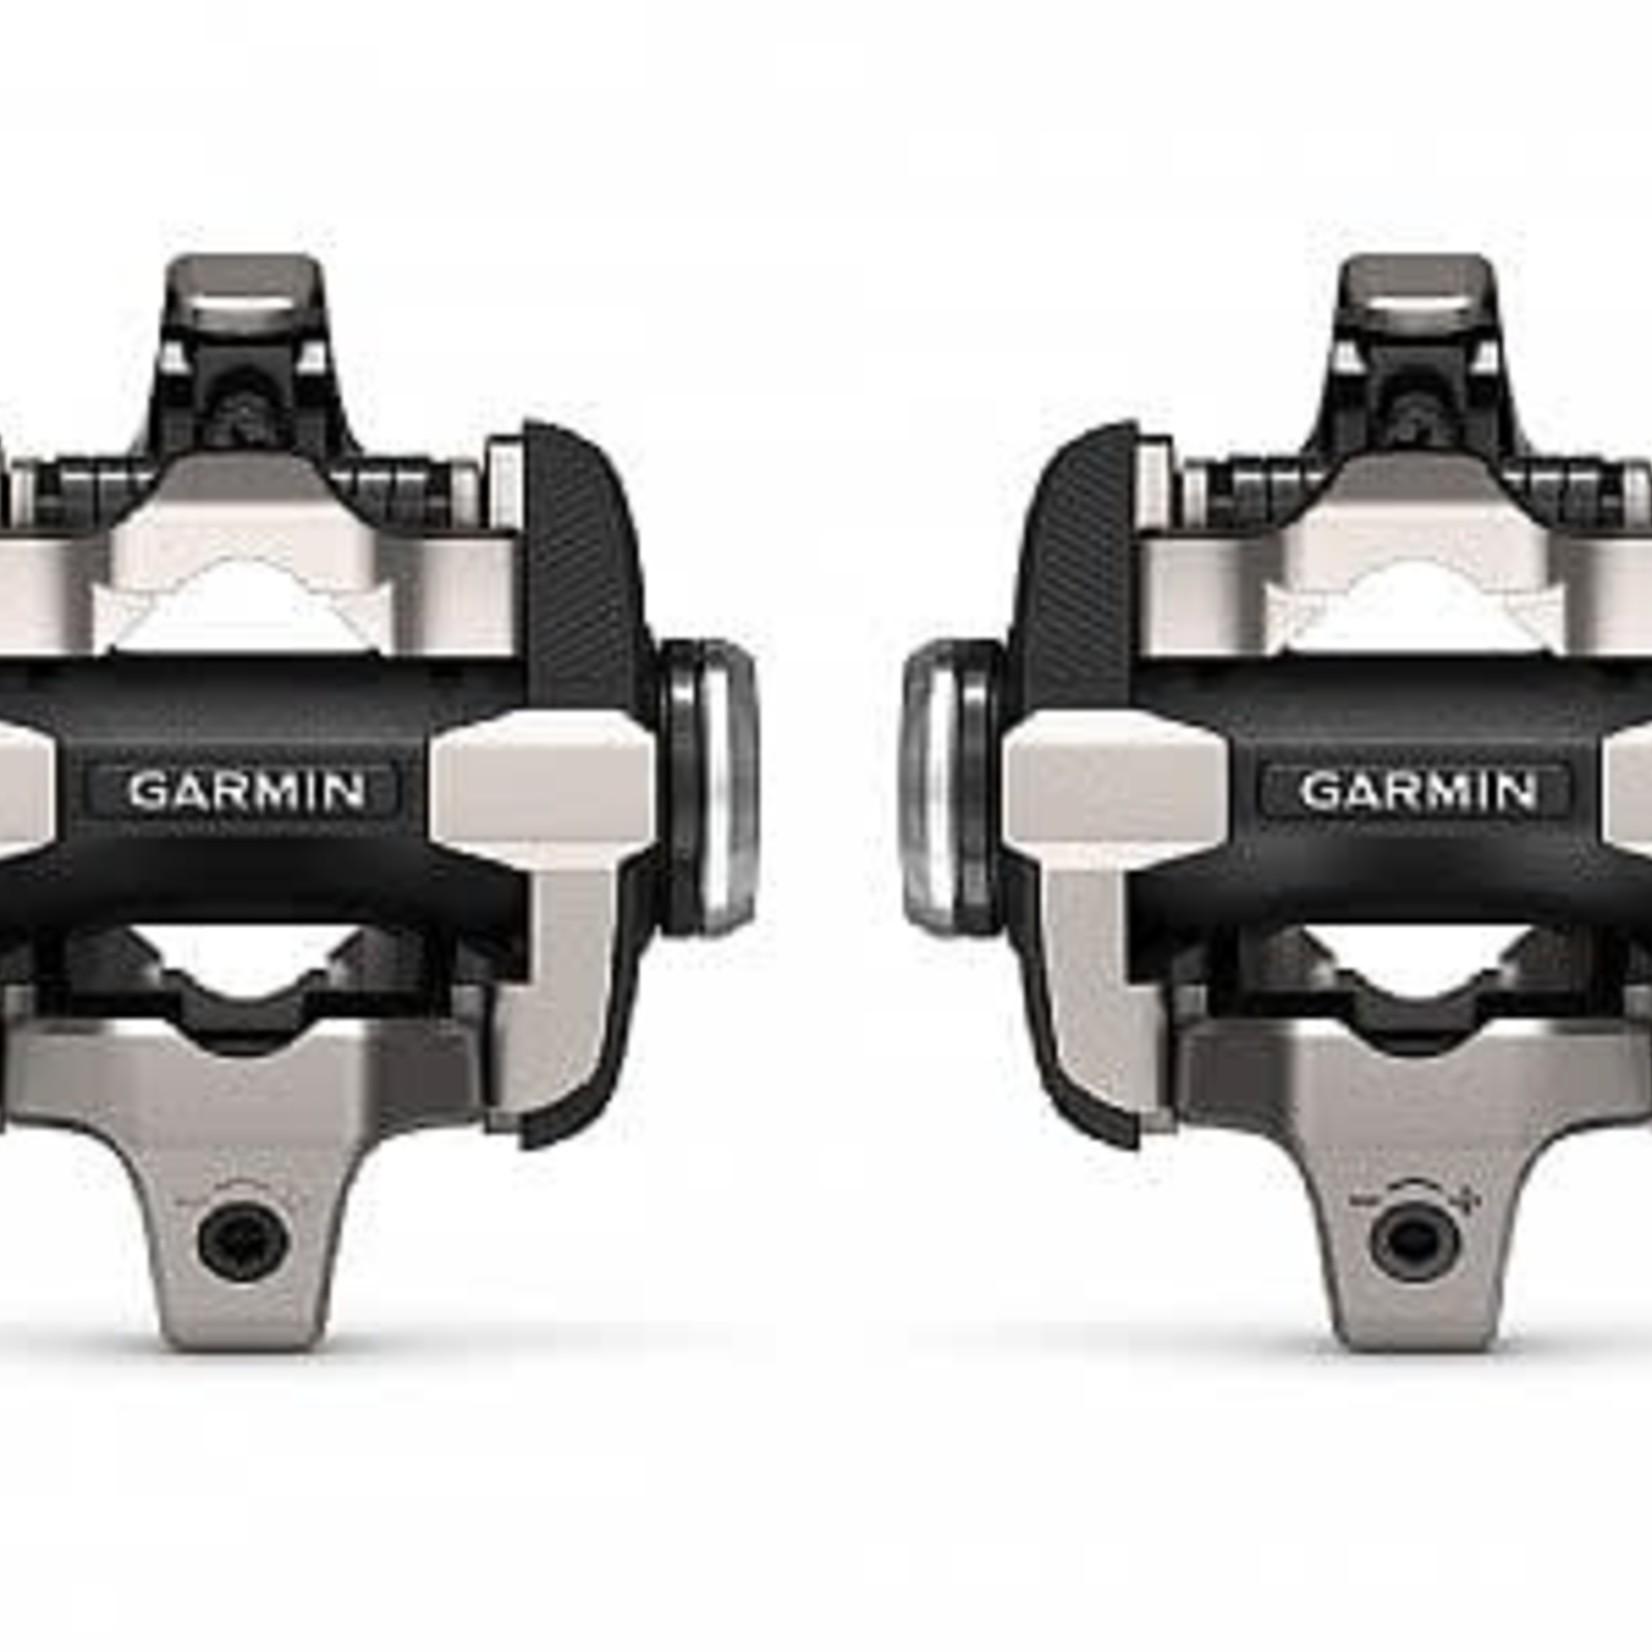 Garmin Garmin Rally XC Pedal Body Conversn Kit